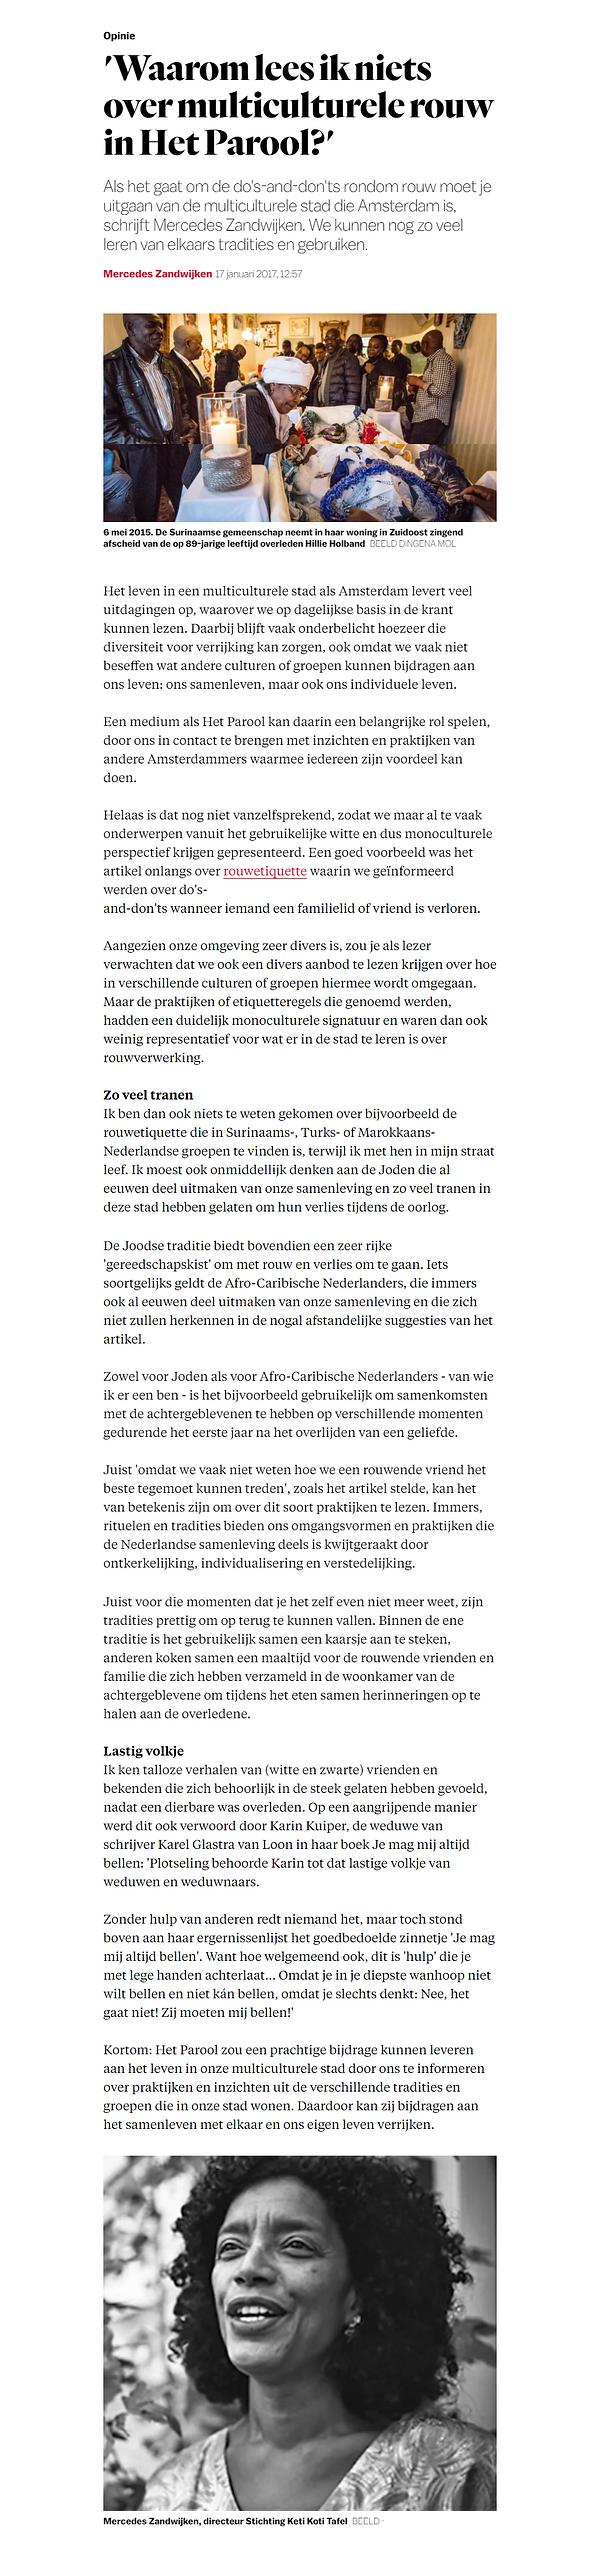 screencapture-parool-nl-nieuws-waarom-le